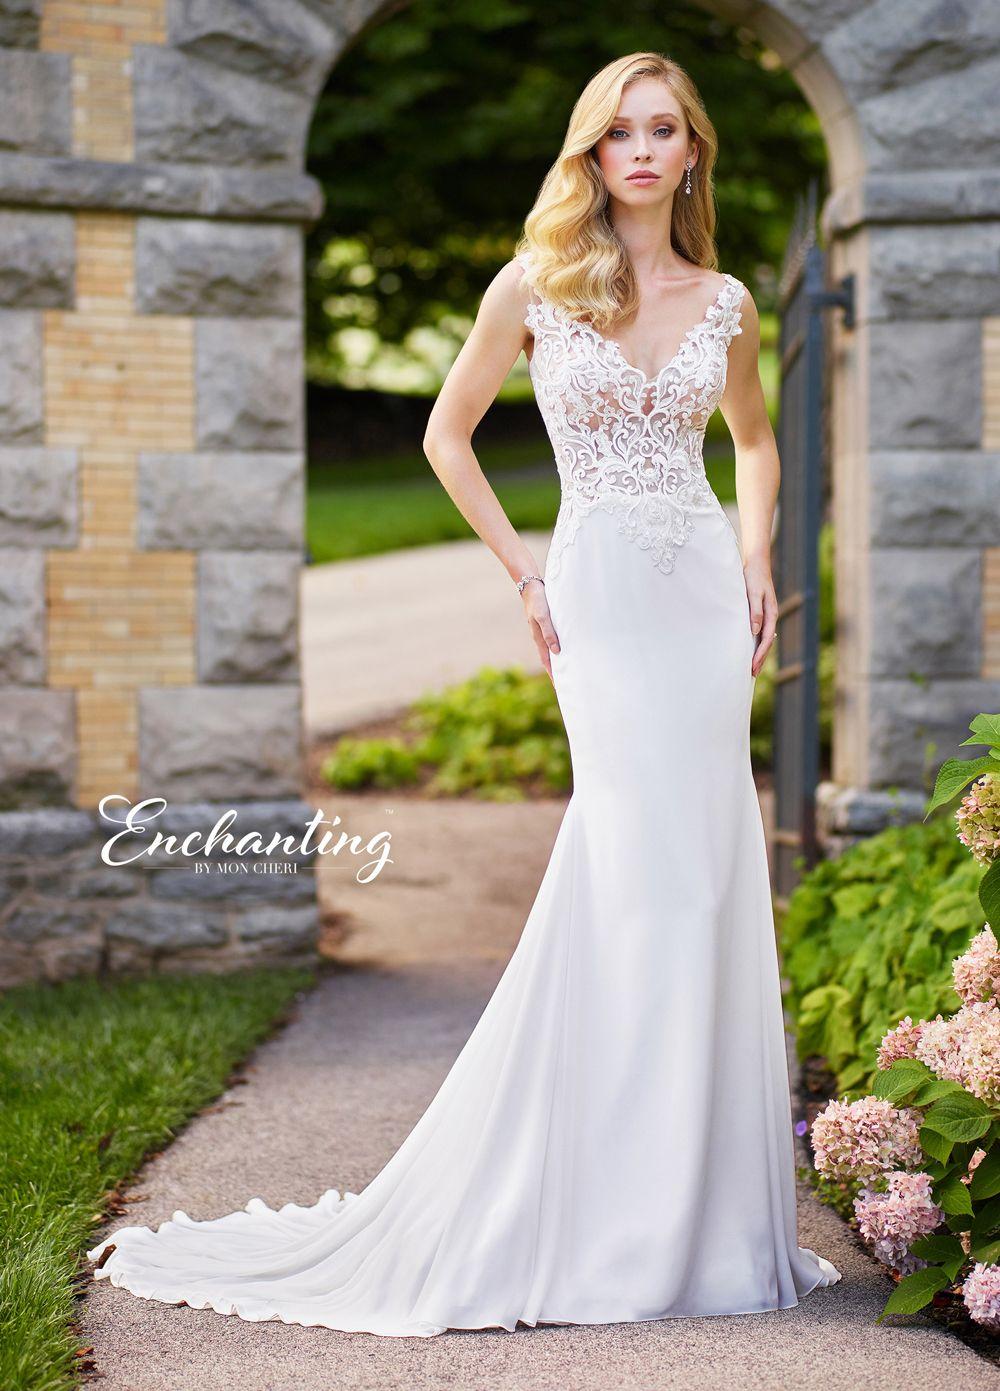 Enchanting by Mon Cheri 118138 Illusion Back Beach Wedding